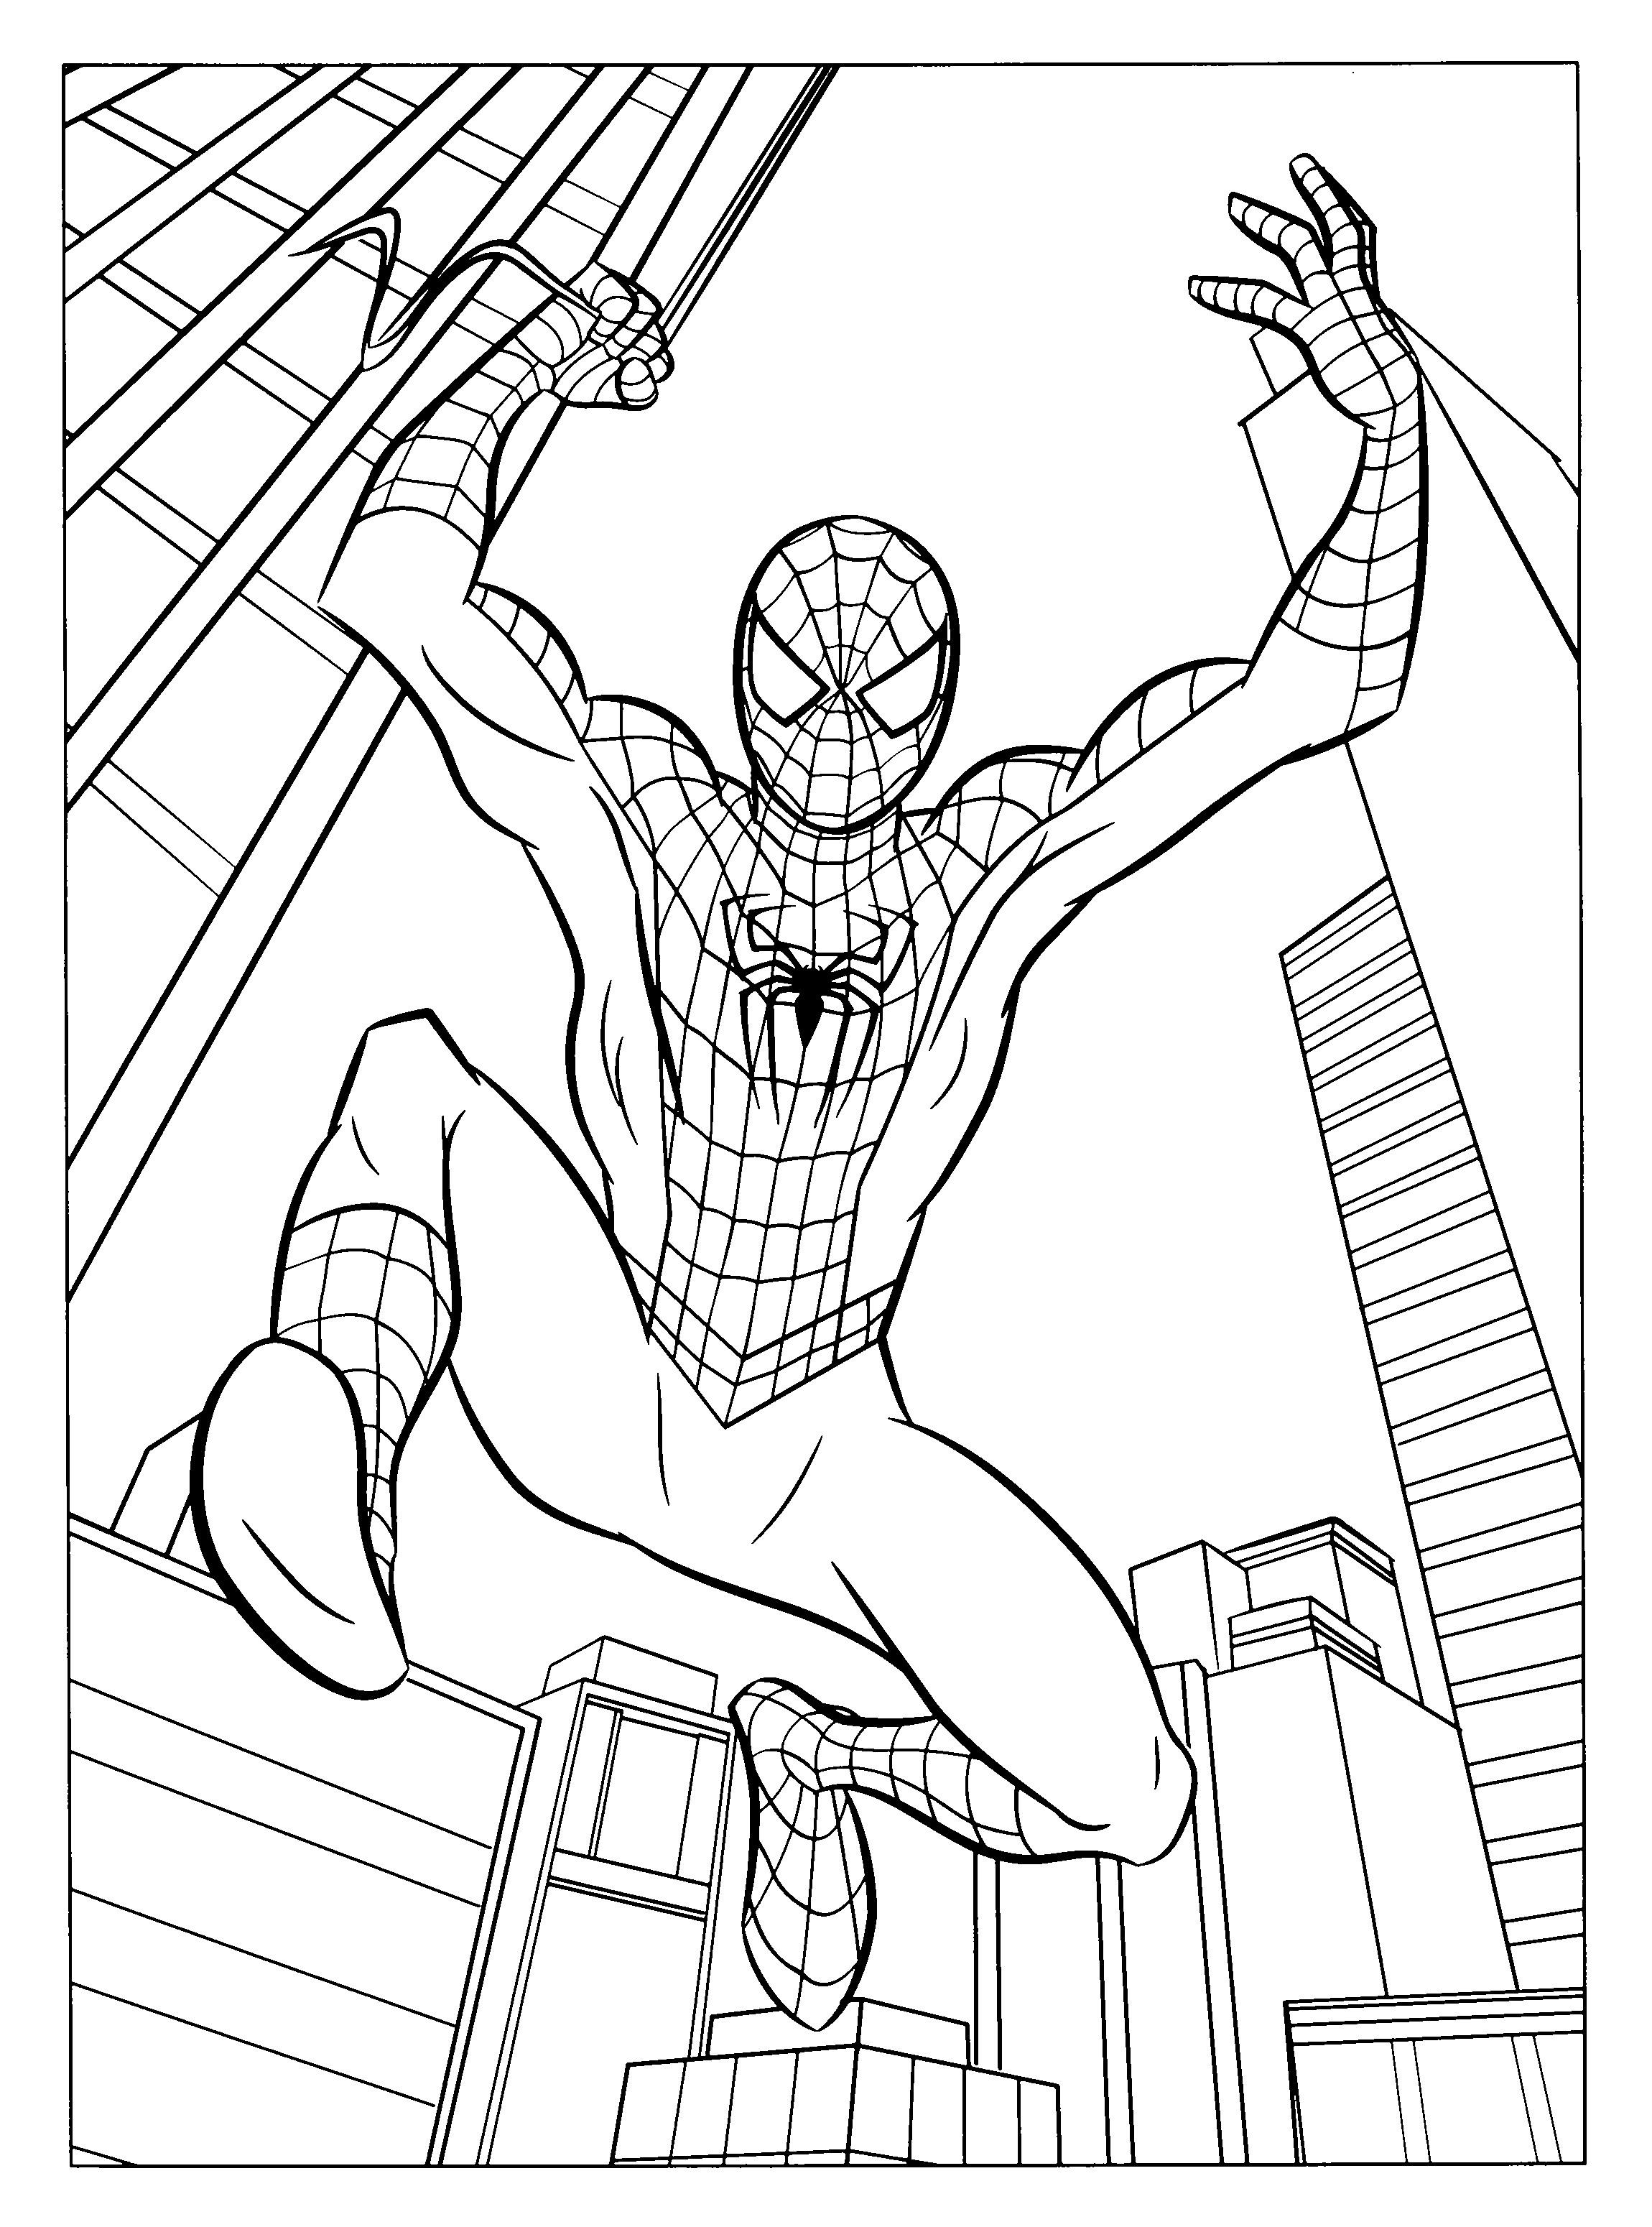 Drawn spider-man coloring book #7